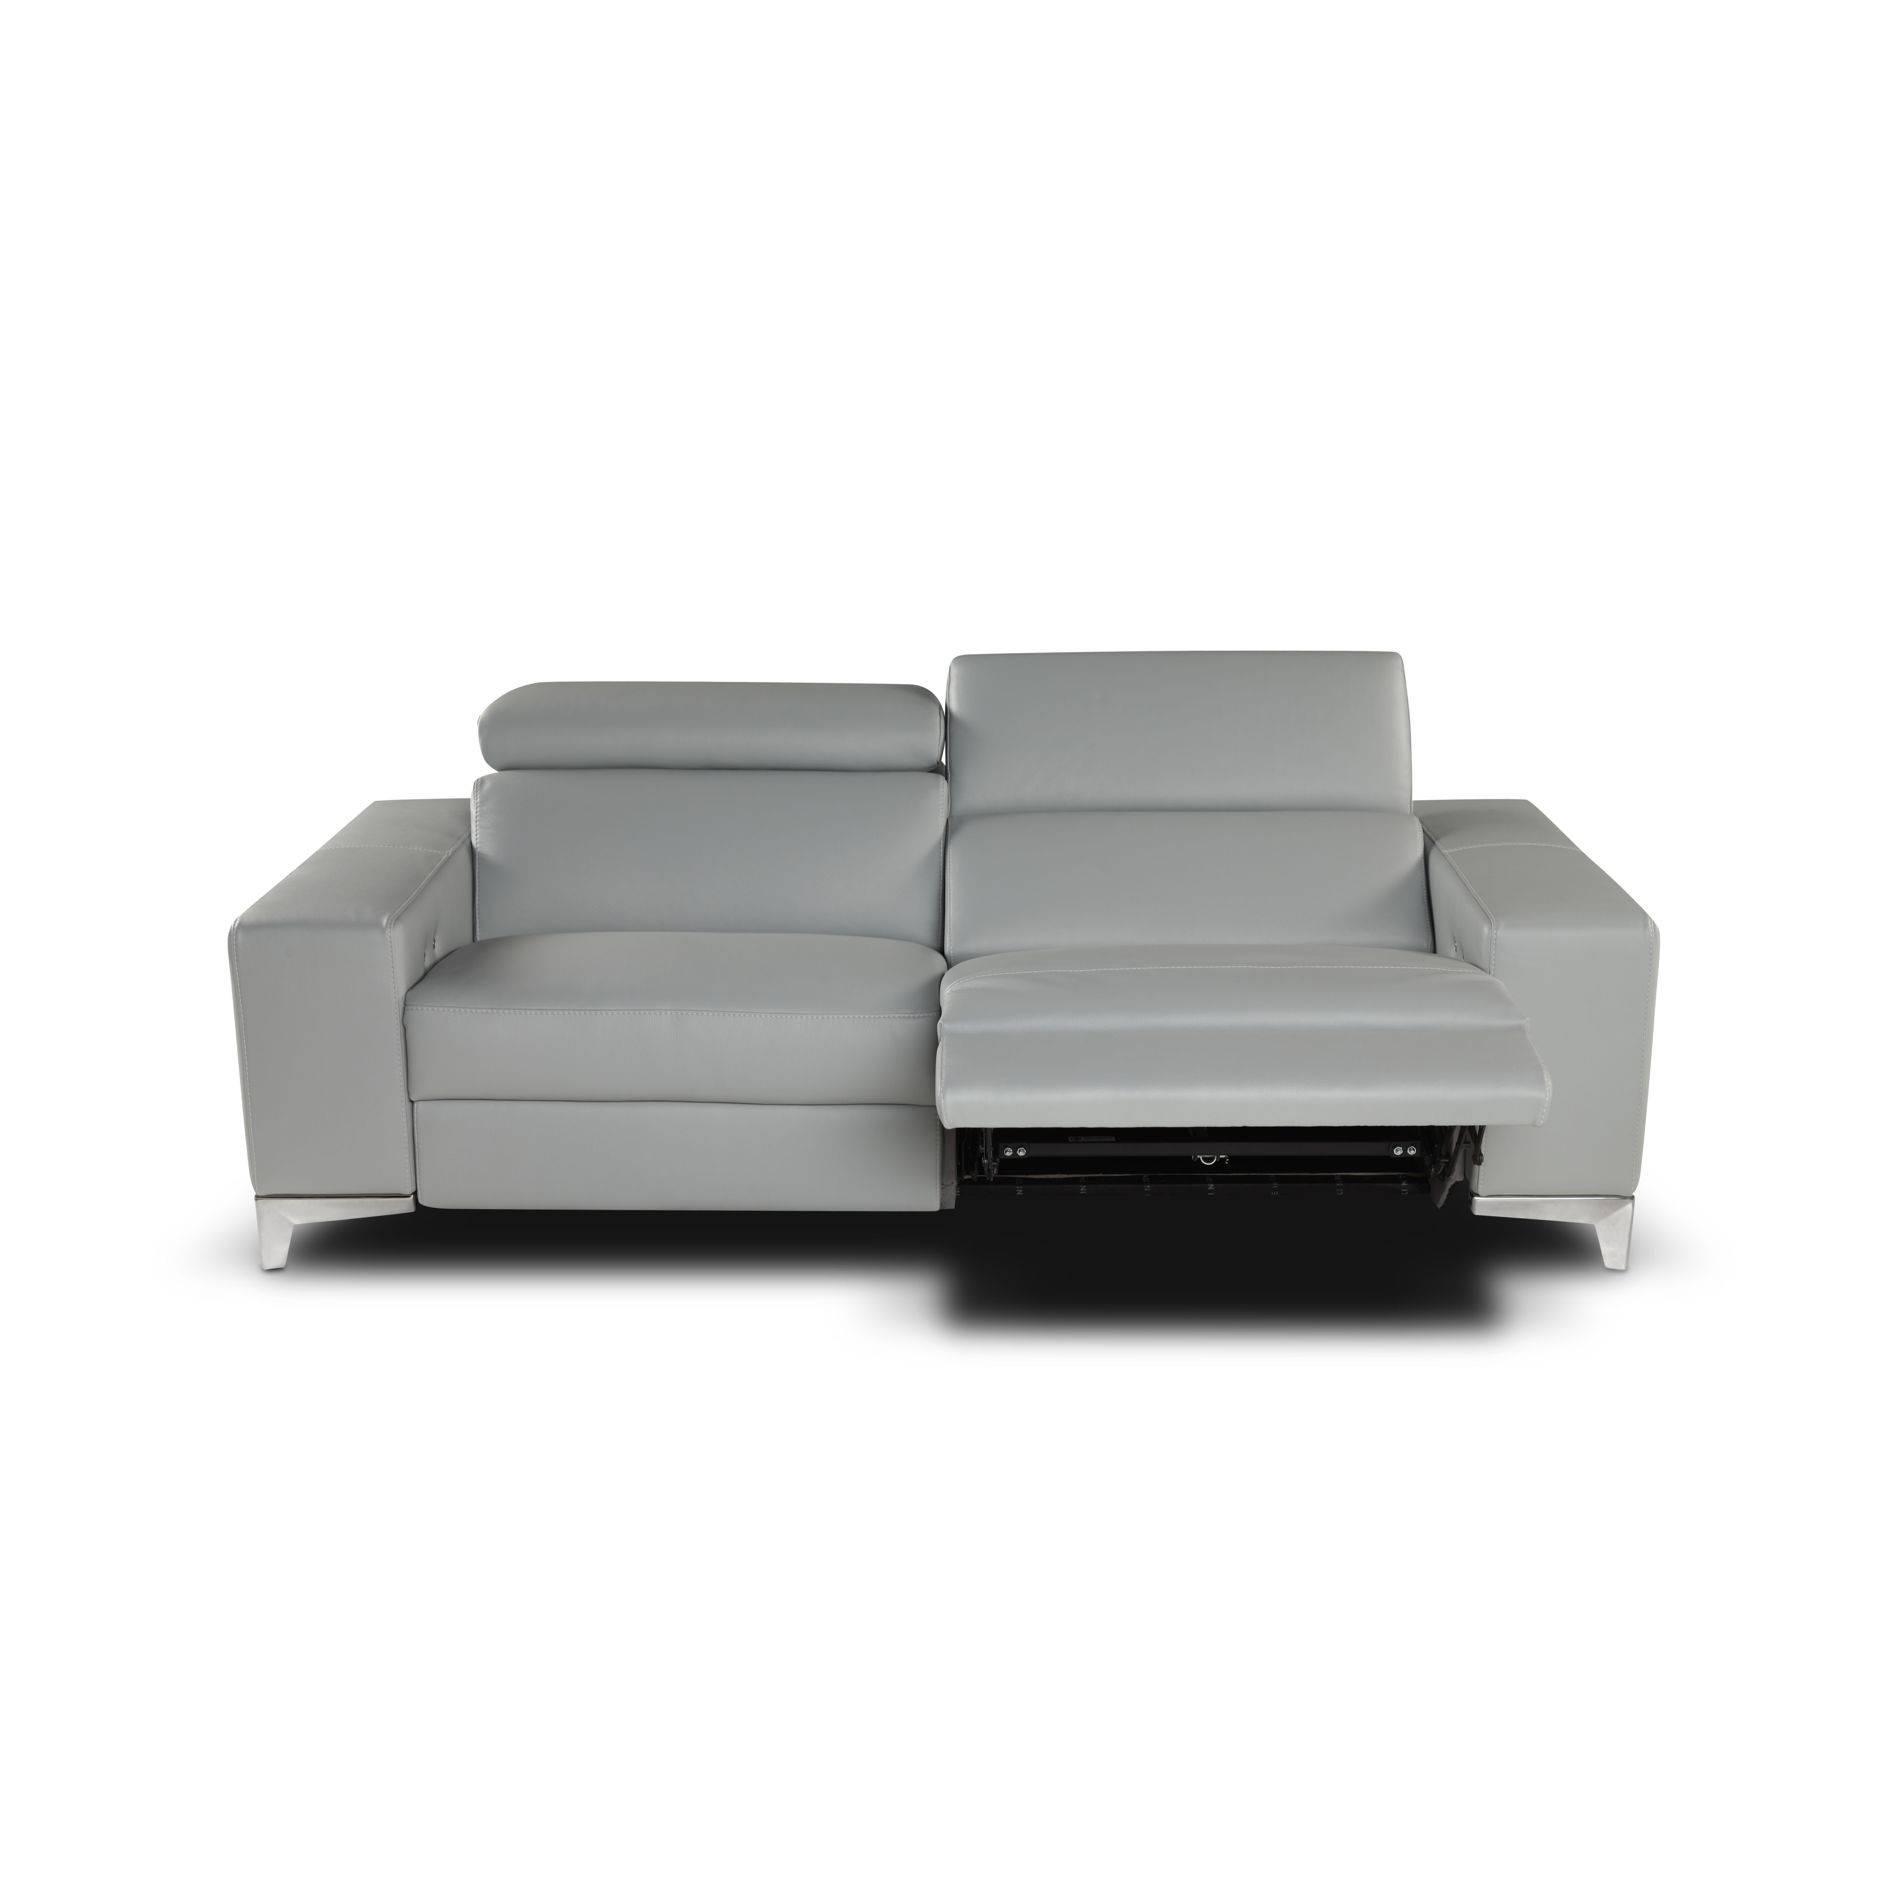 Queen Leather Sofa Set | Giuseppe&giuseppe Within Italian Recliner Sofas (View 12 of 15)